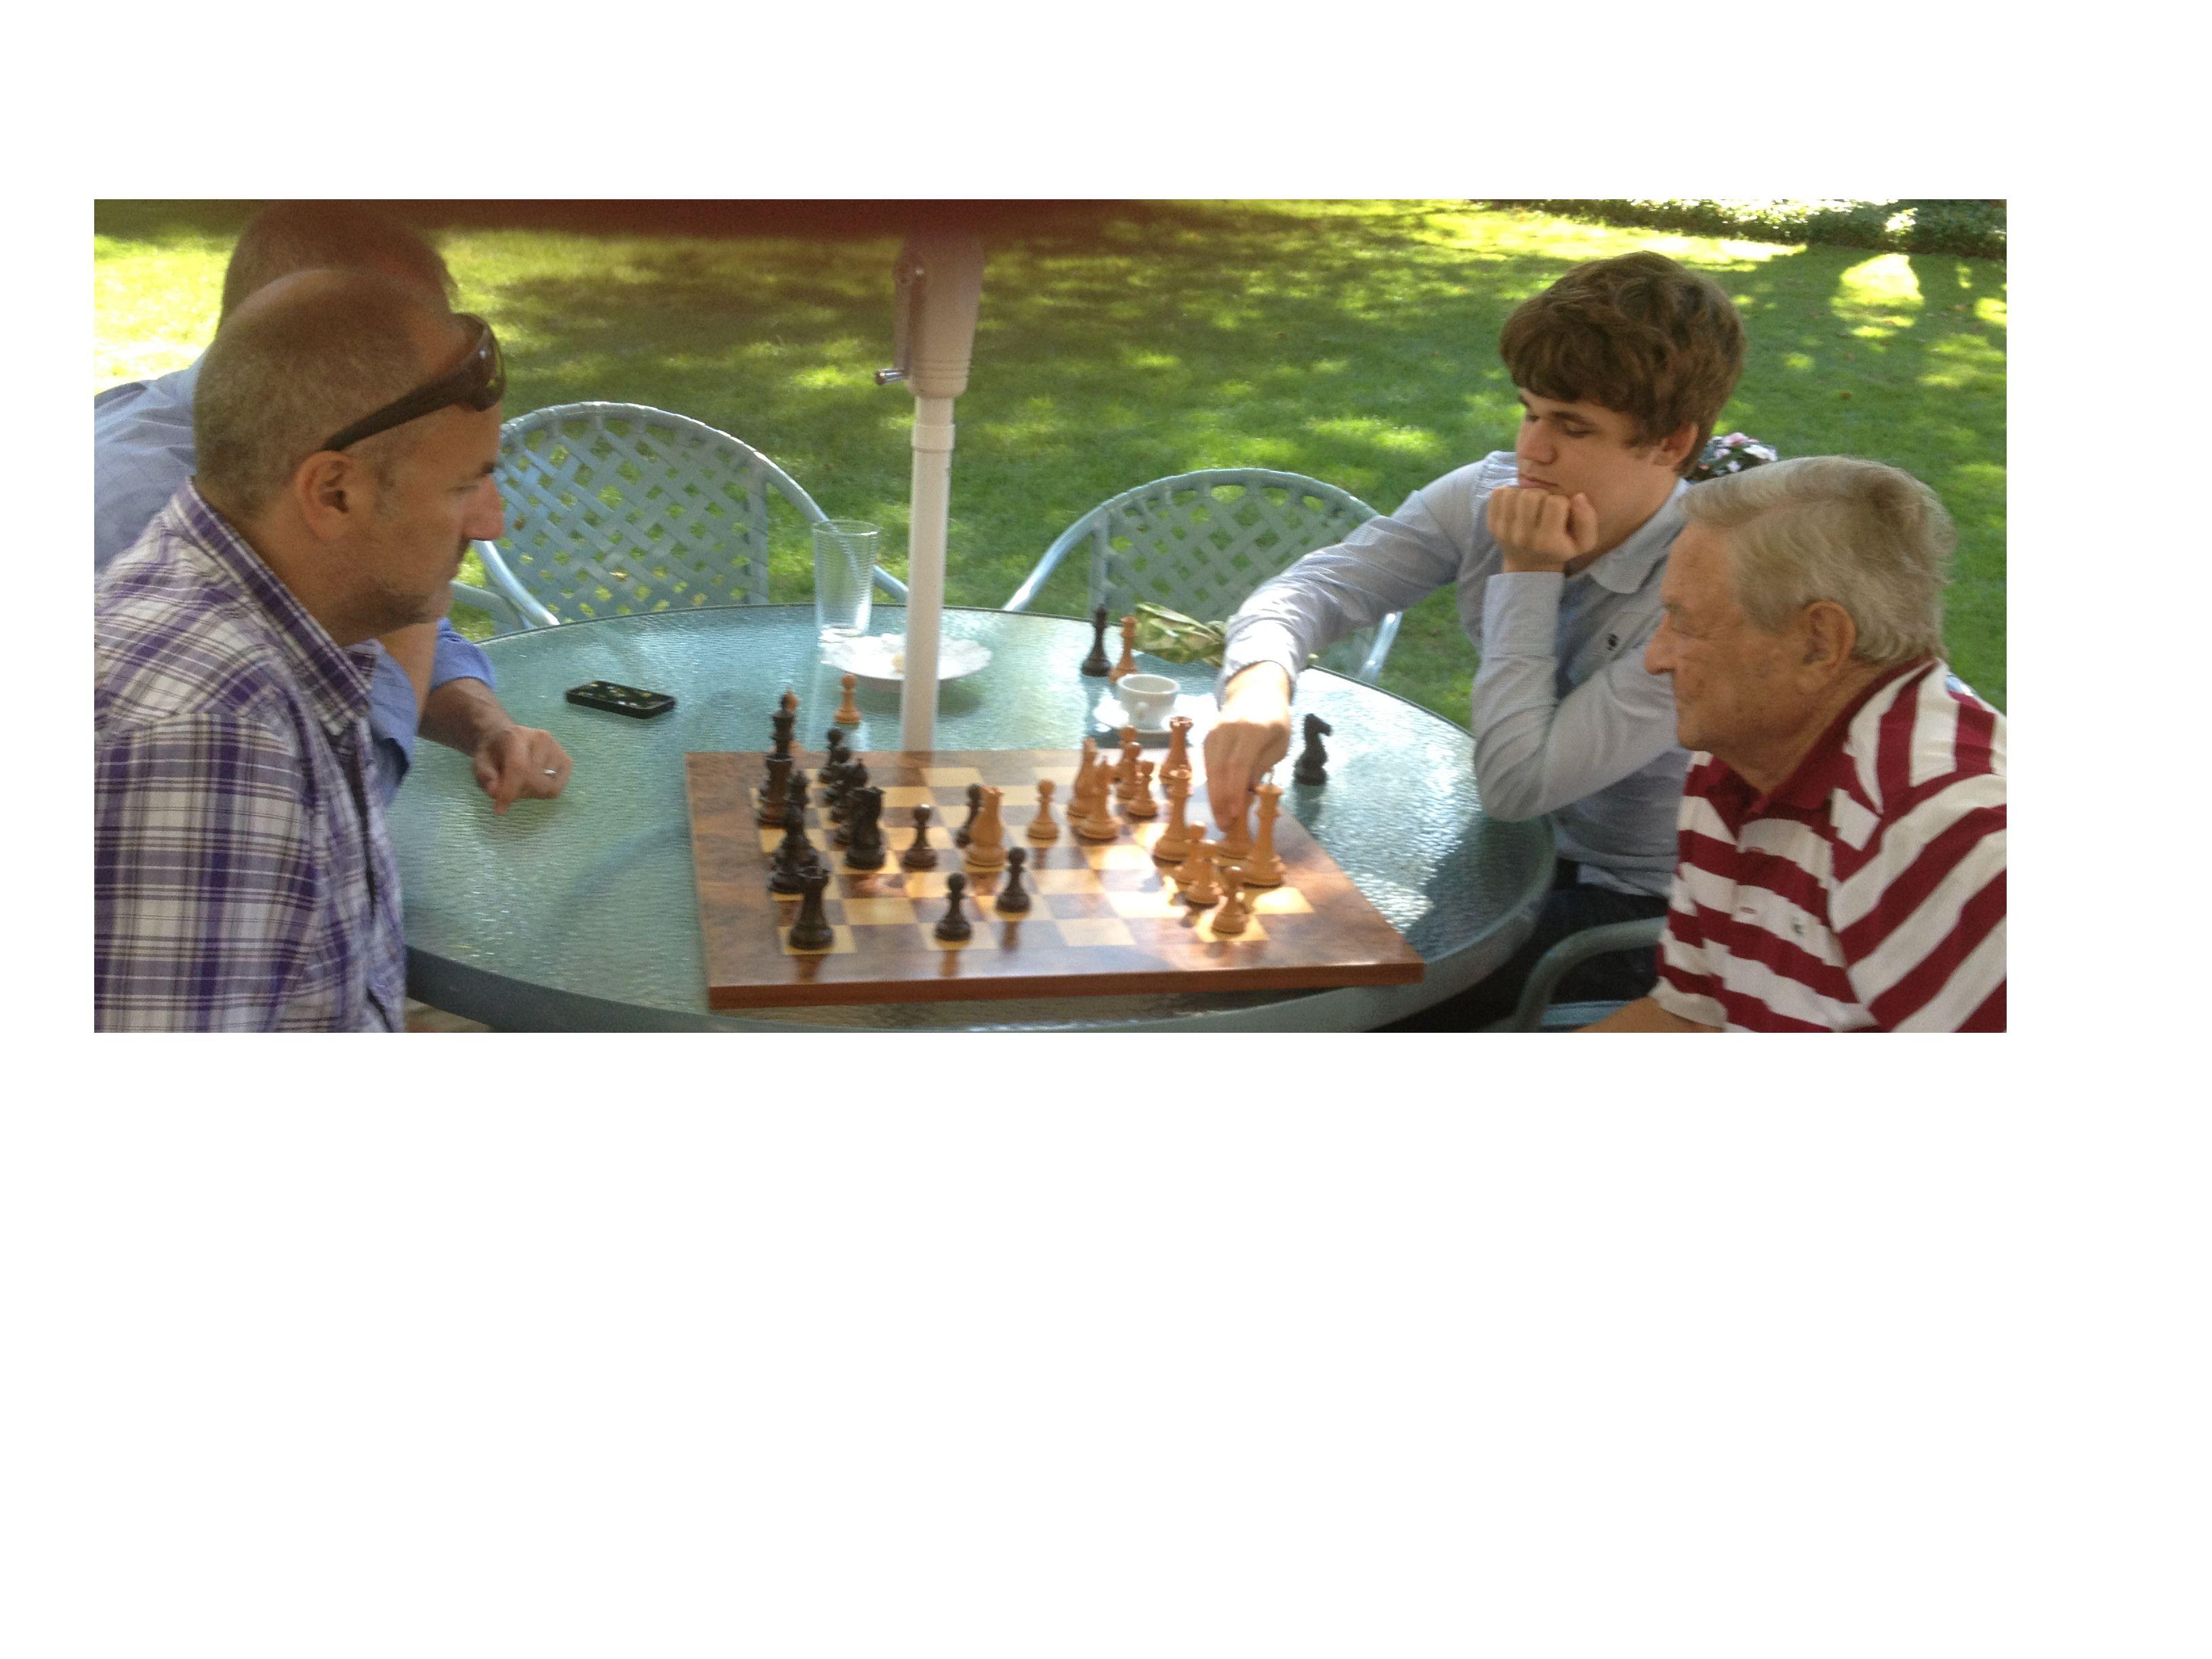 2012-09-05-CarlsenSoros.jpg